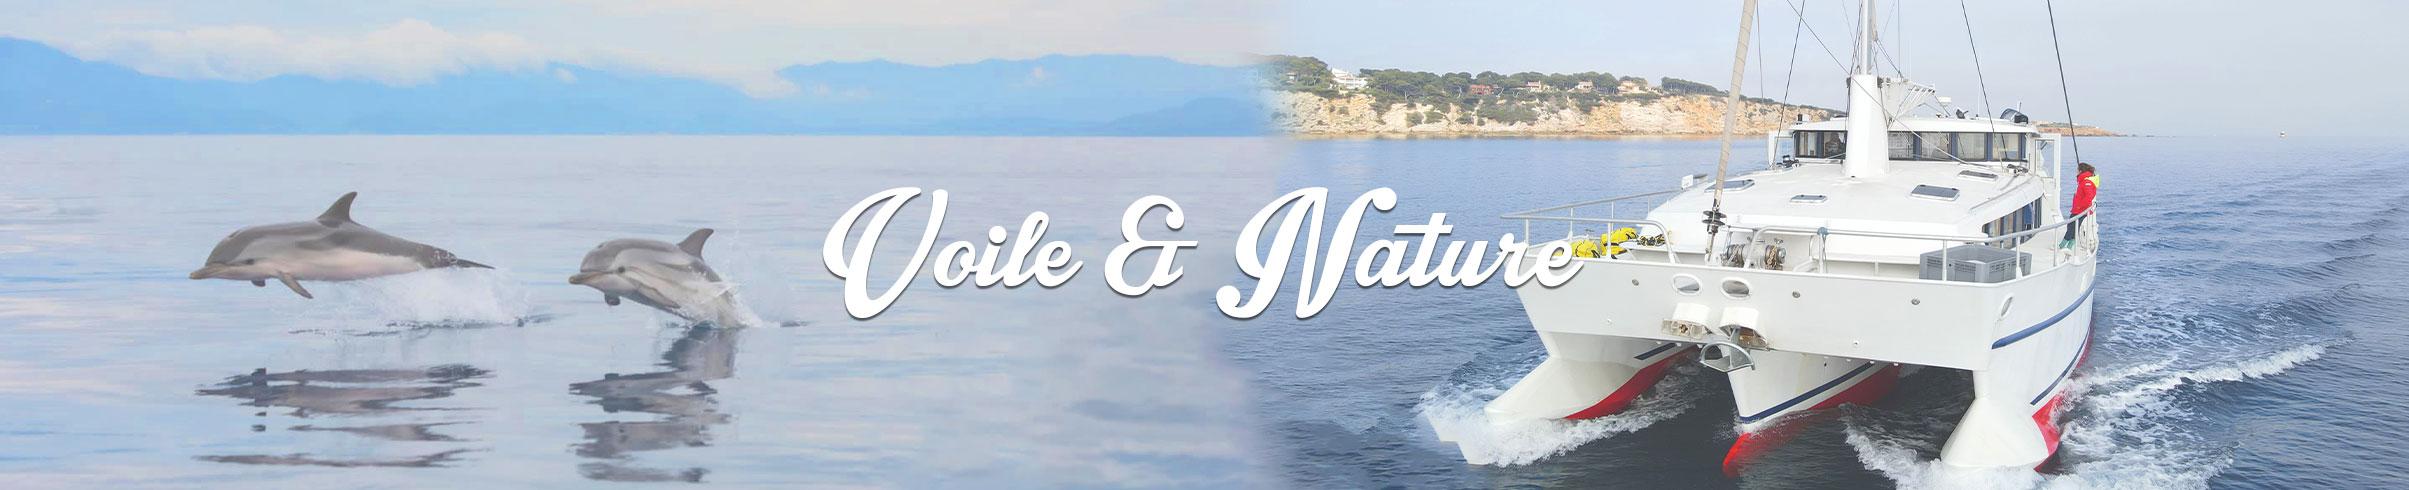 Voile & Nature